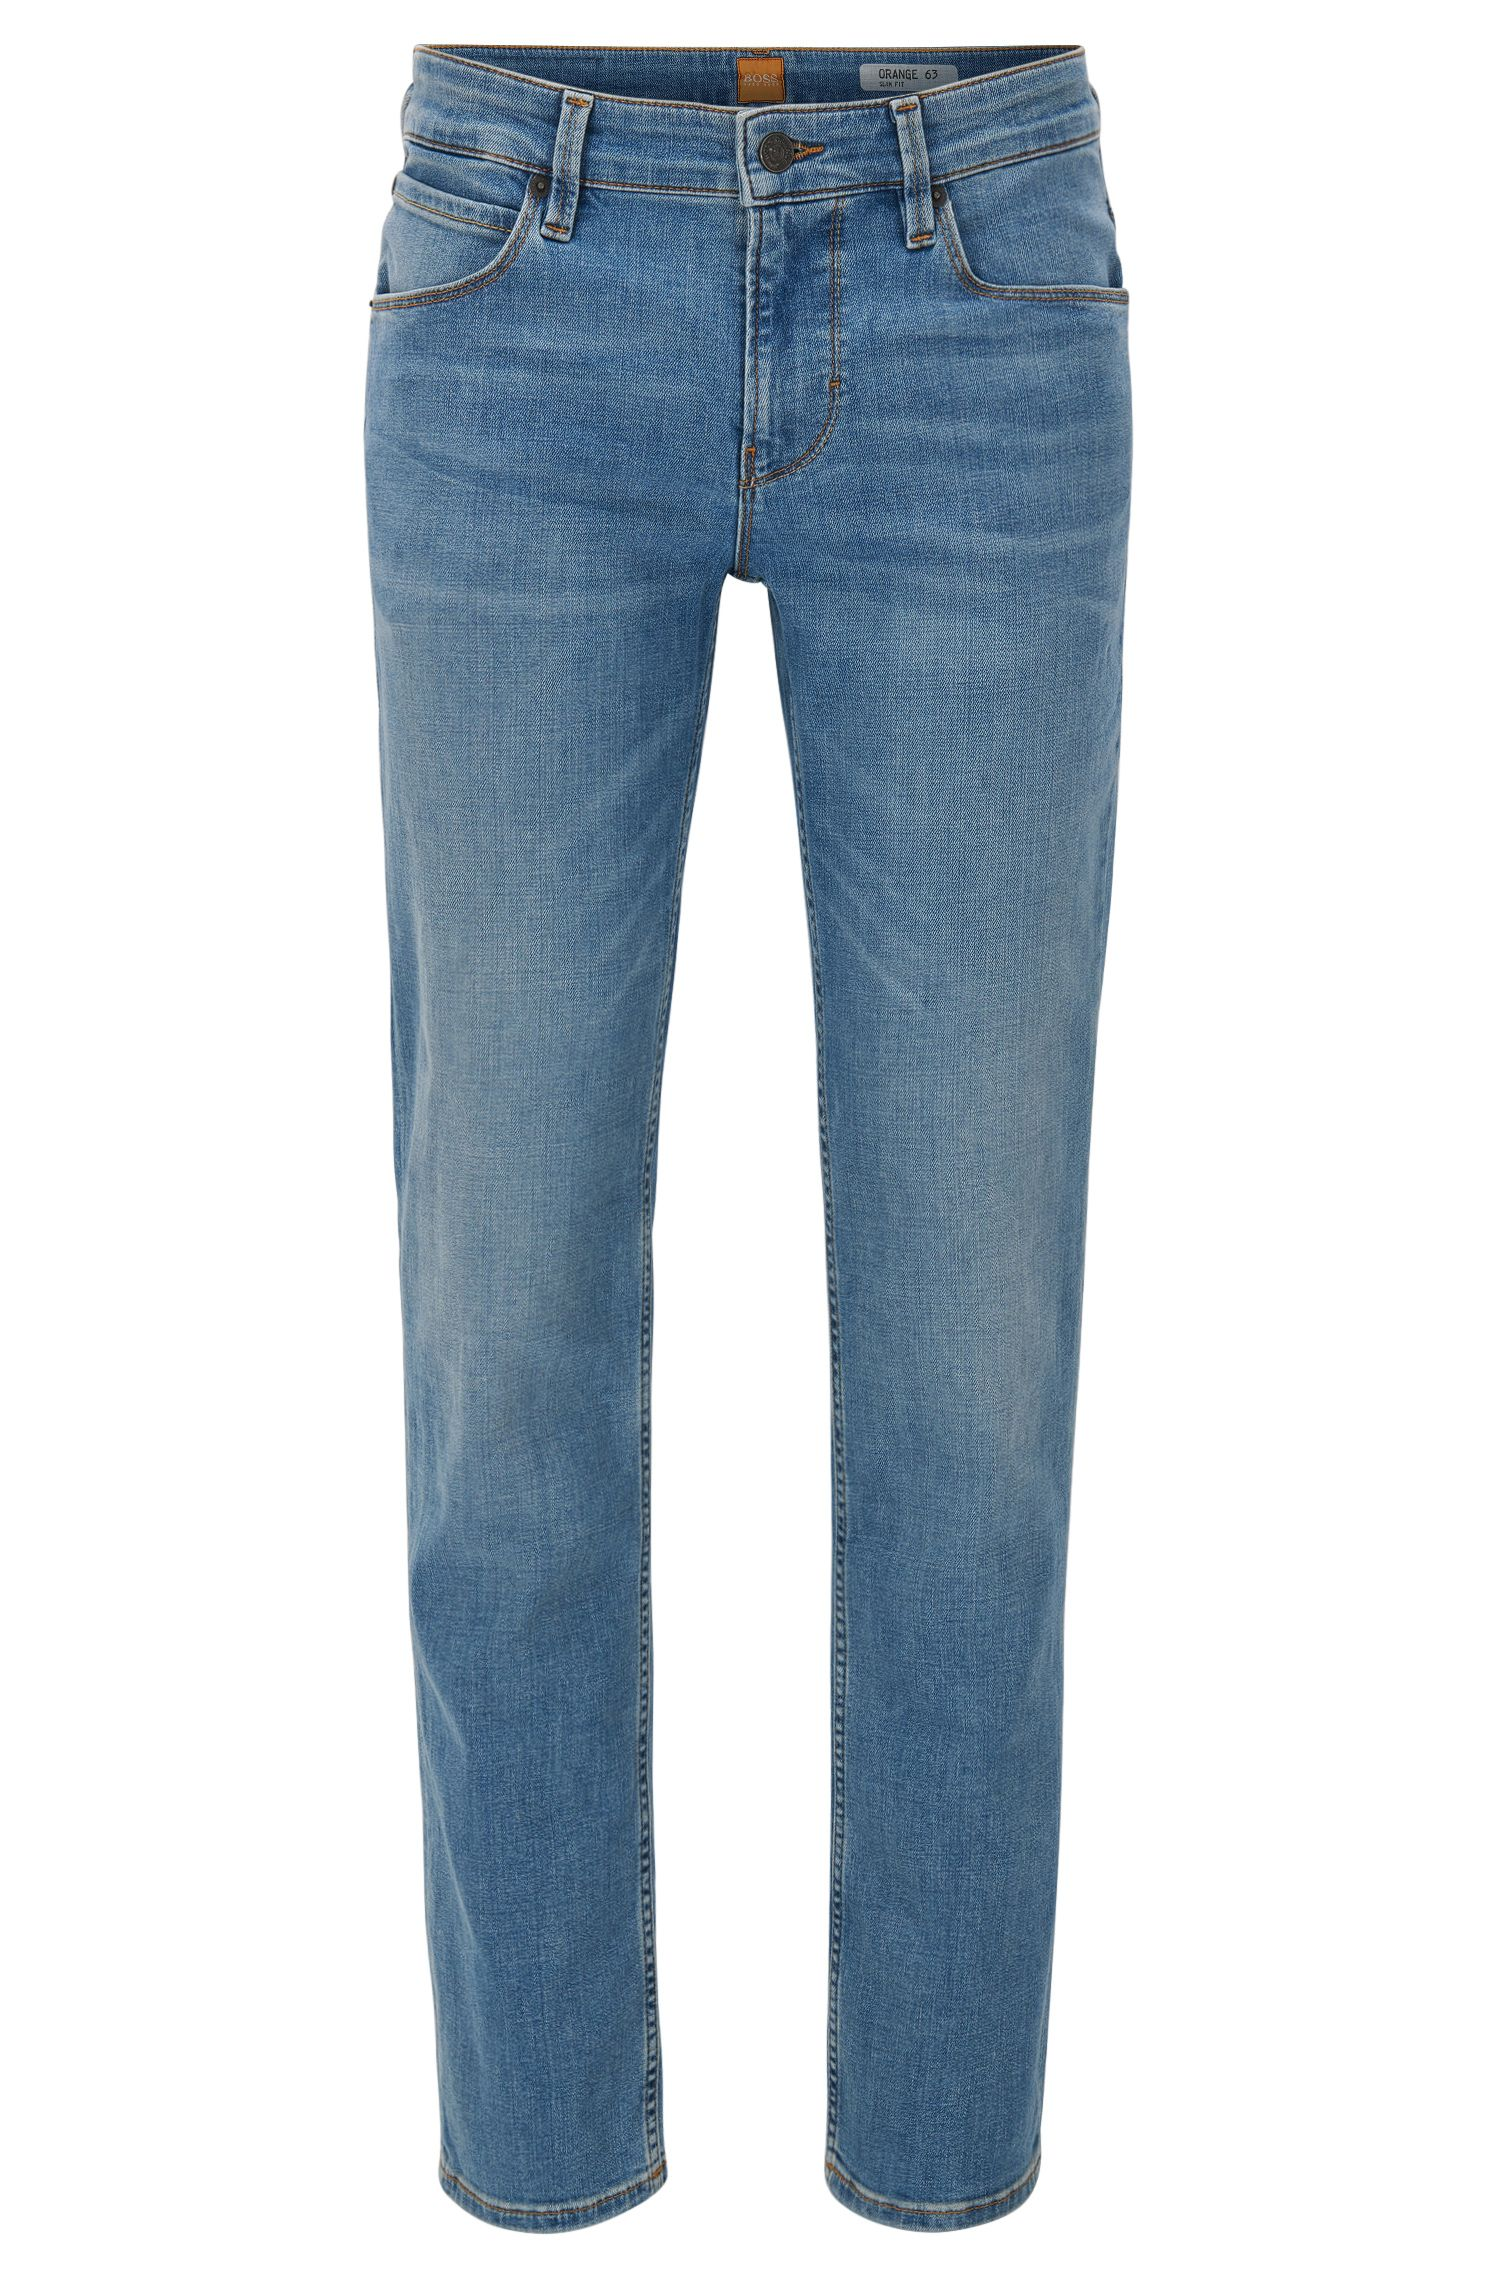 'Orange 63'   Slim Fit, 11.25 oz Stretch Cotton Blend Jeans